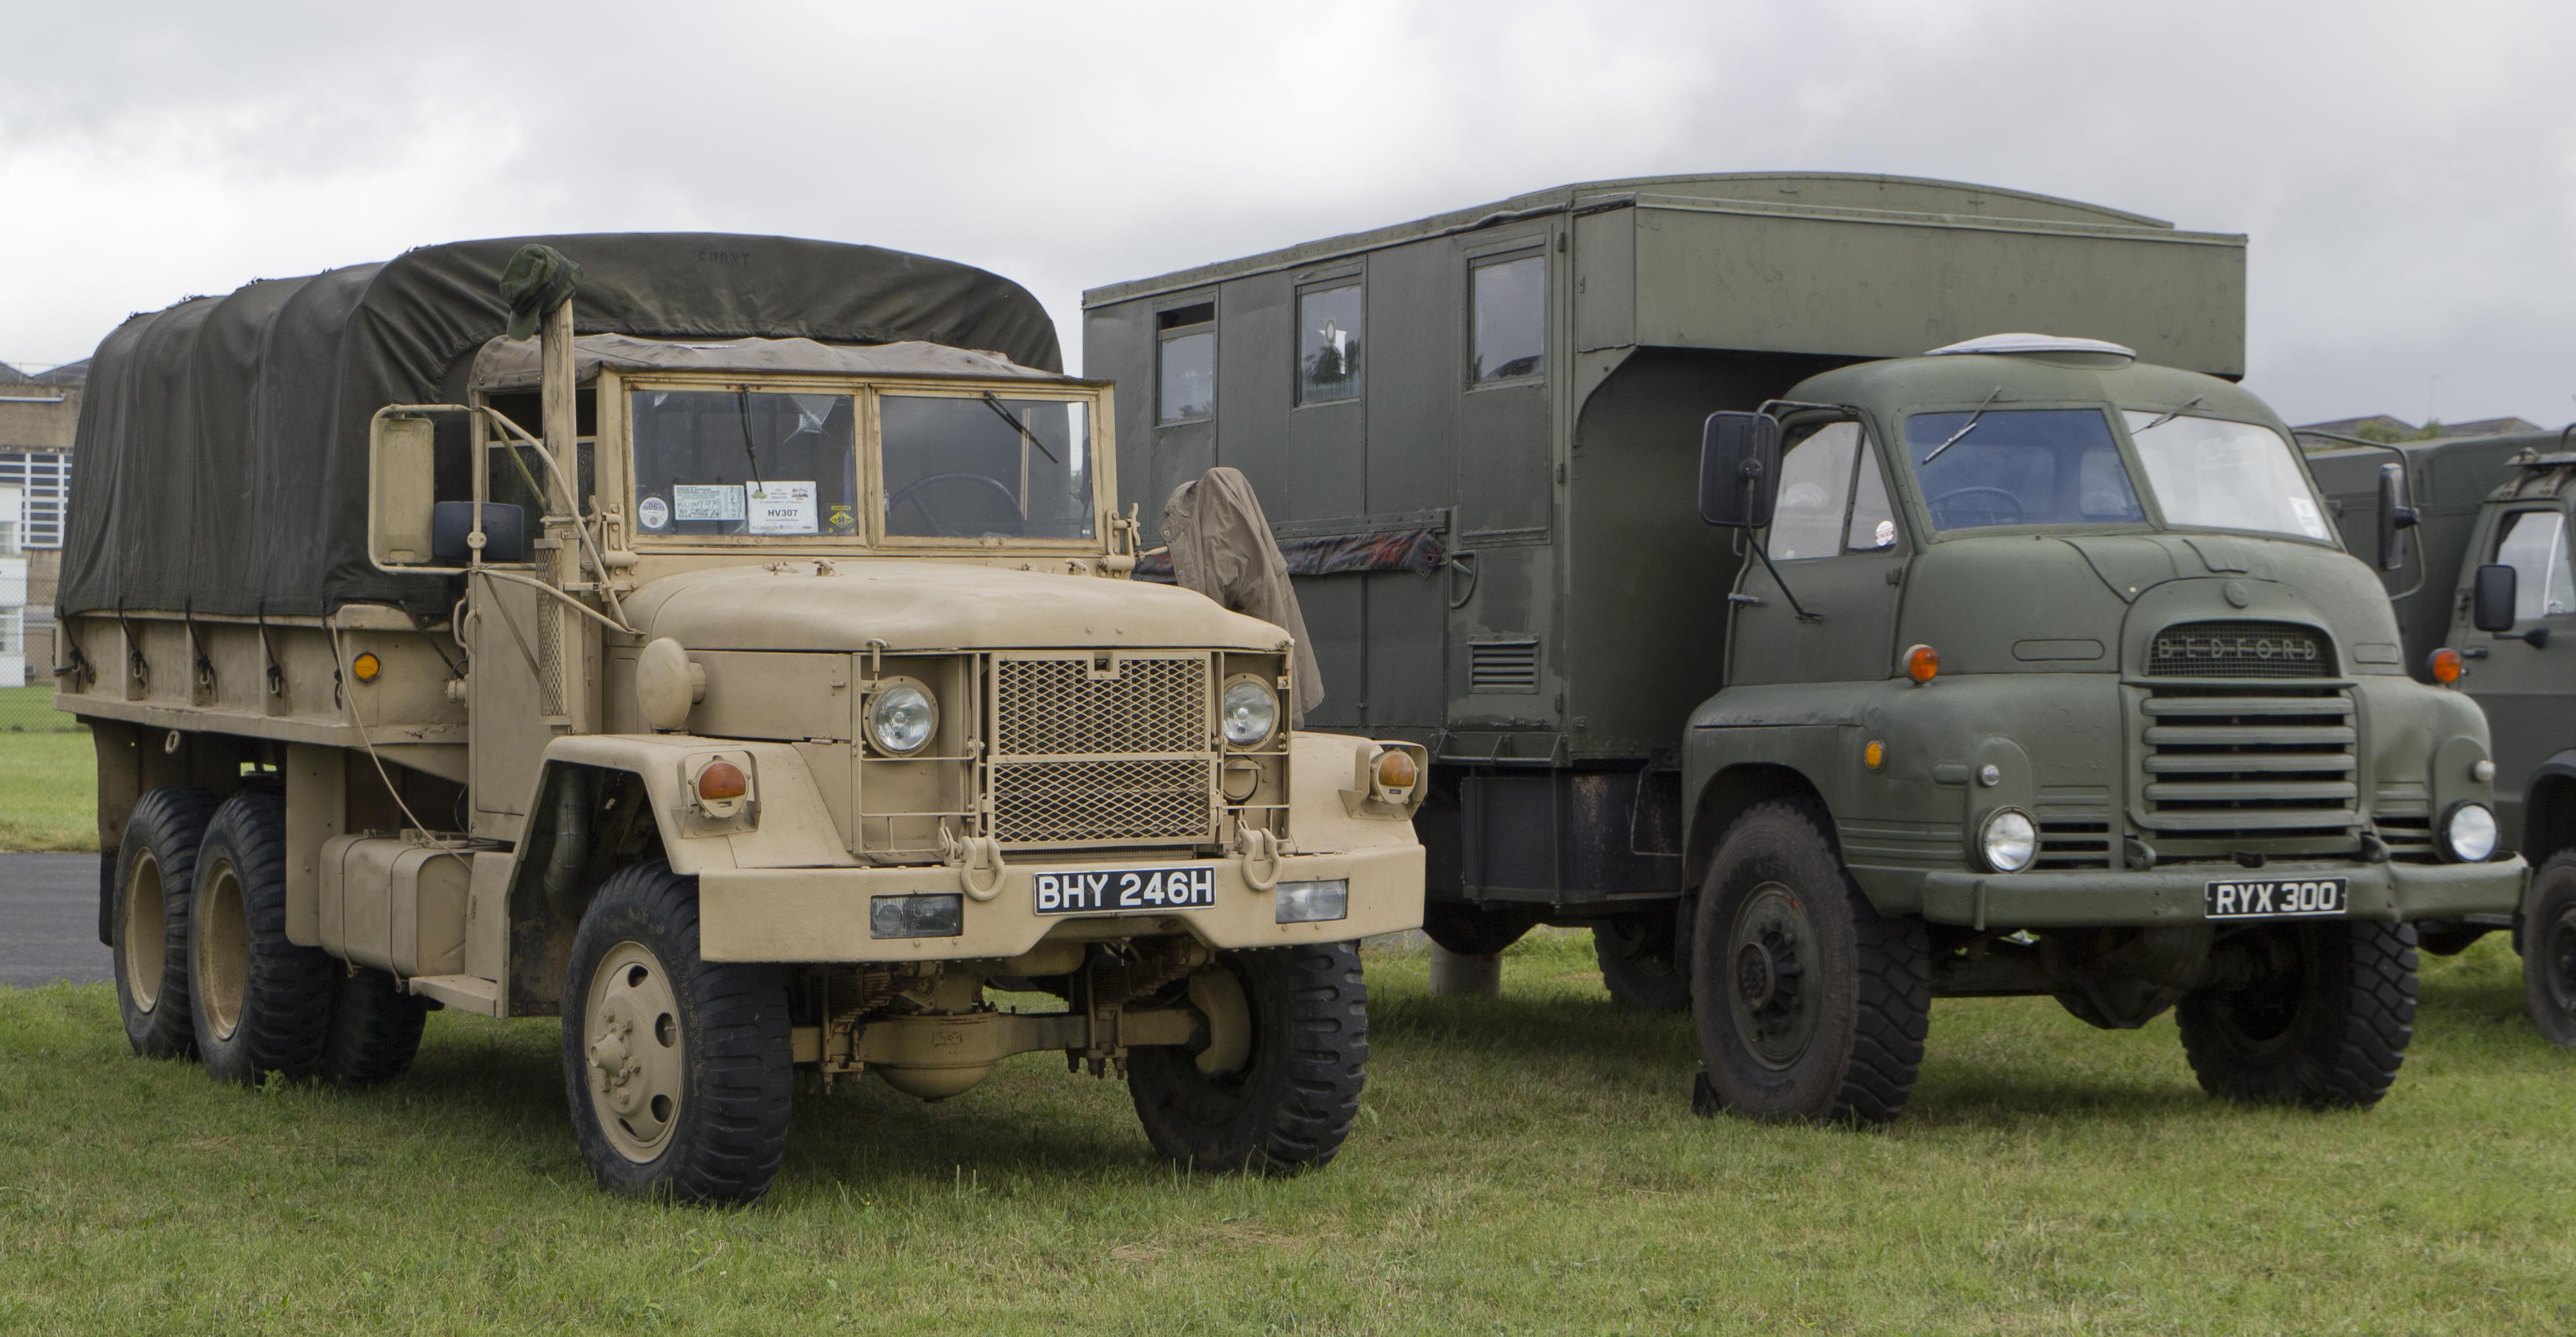 File:Military Trucks (7717866766).jpg - Wikimedia Commons